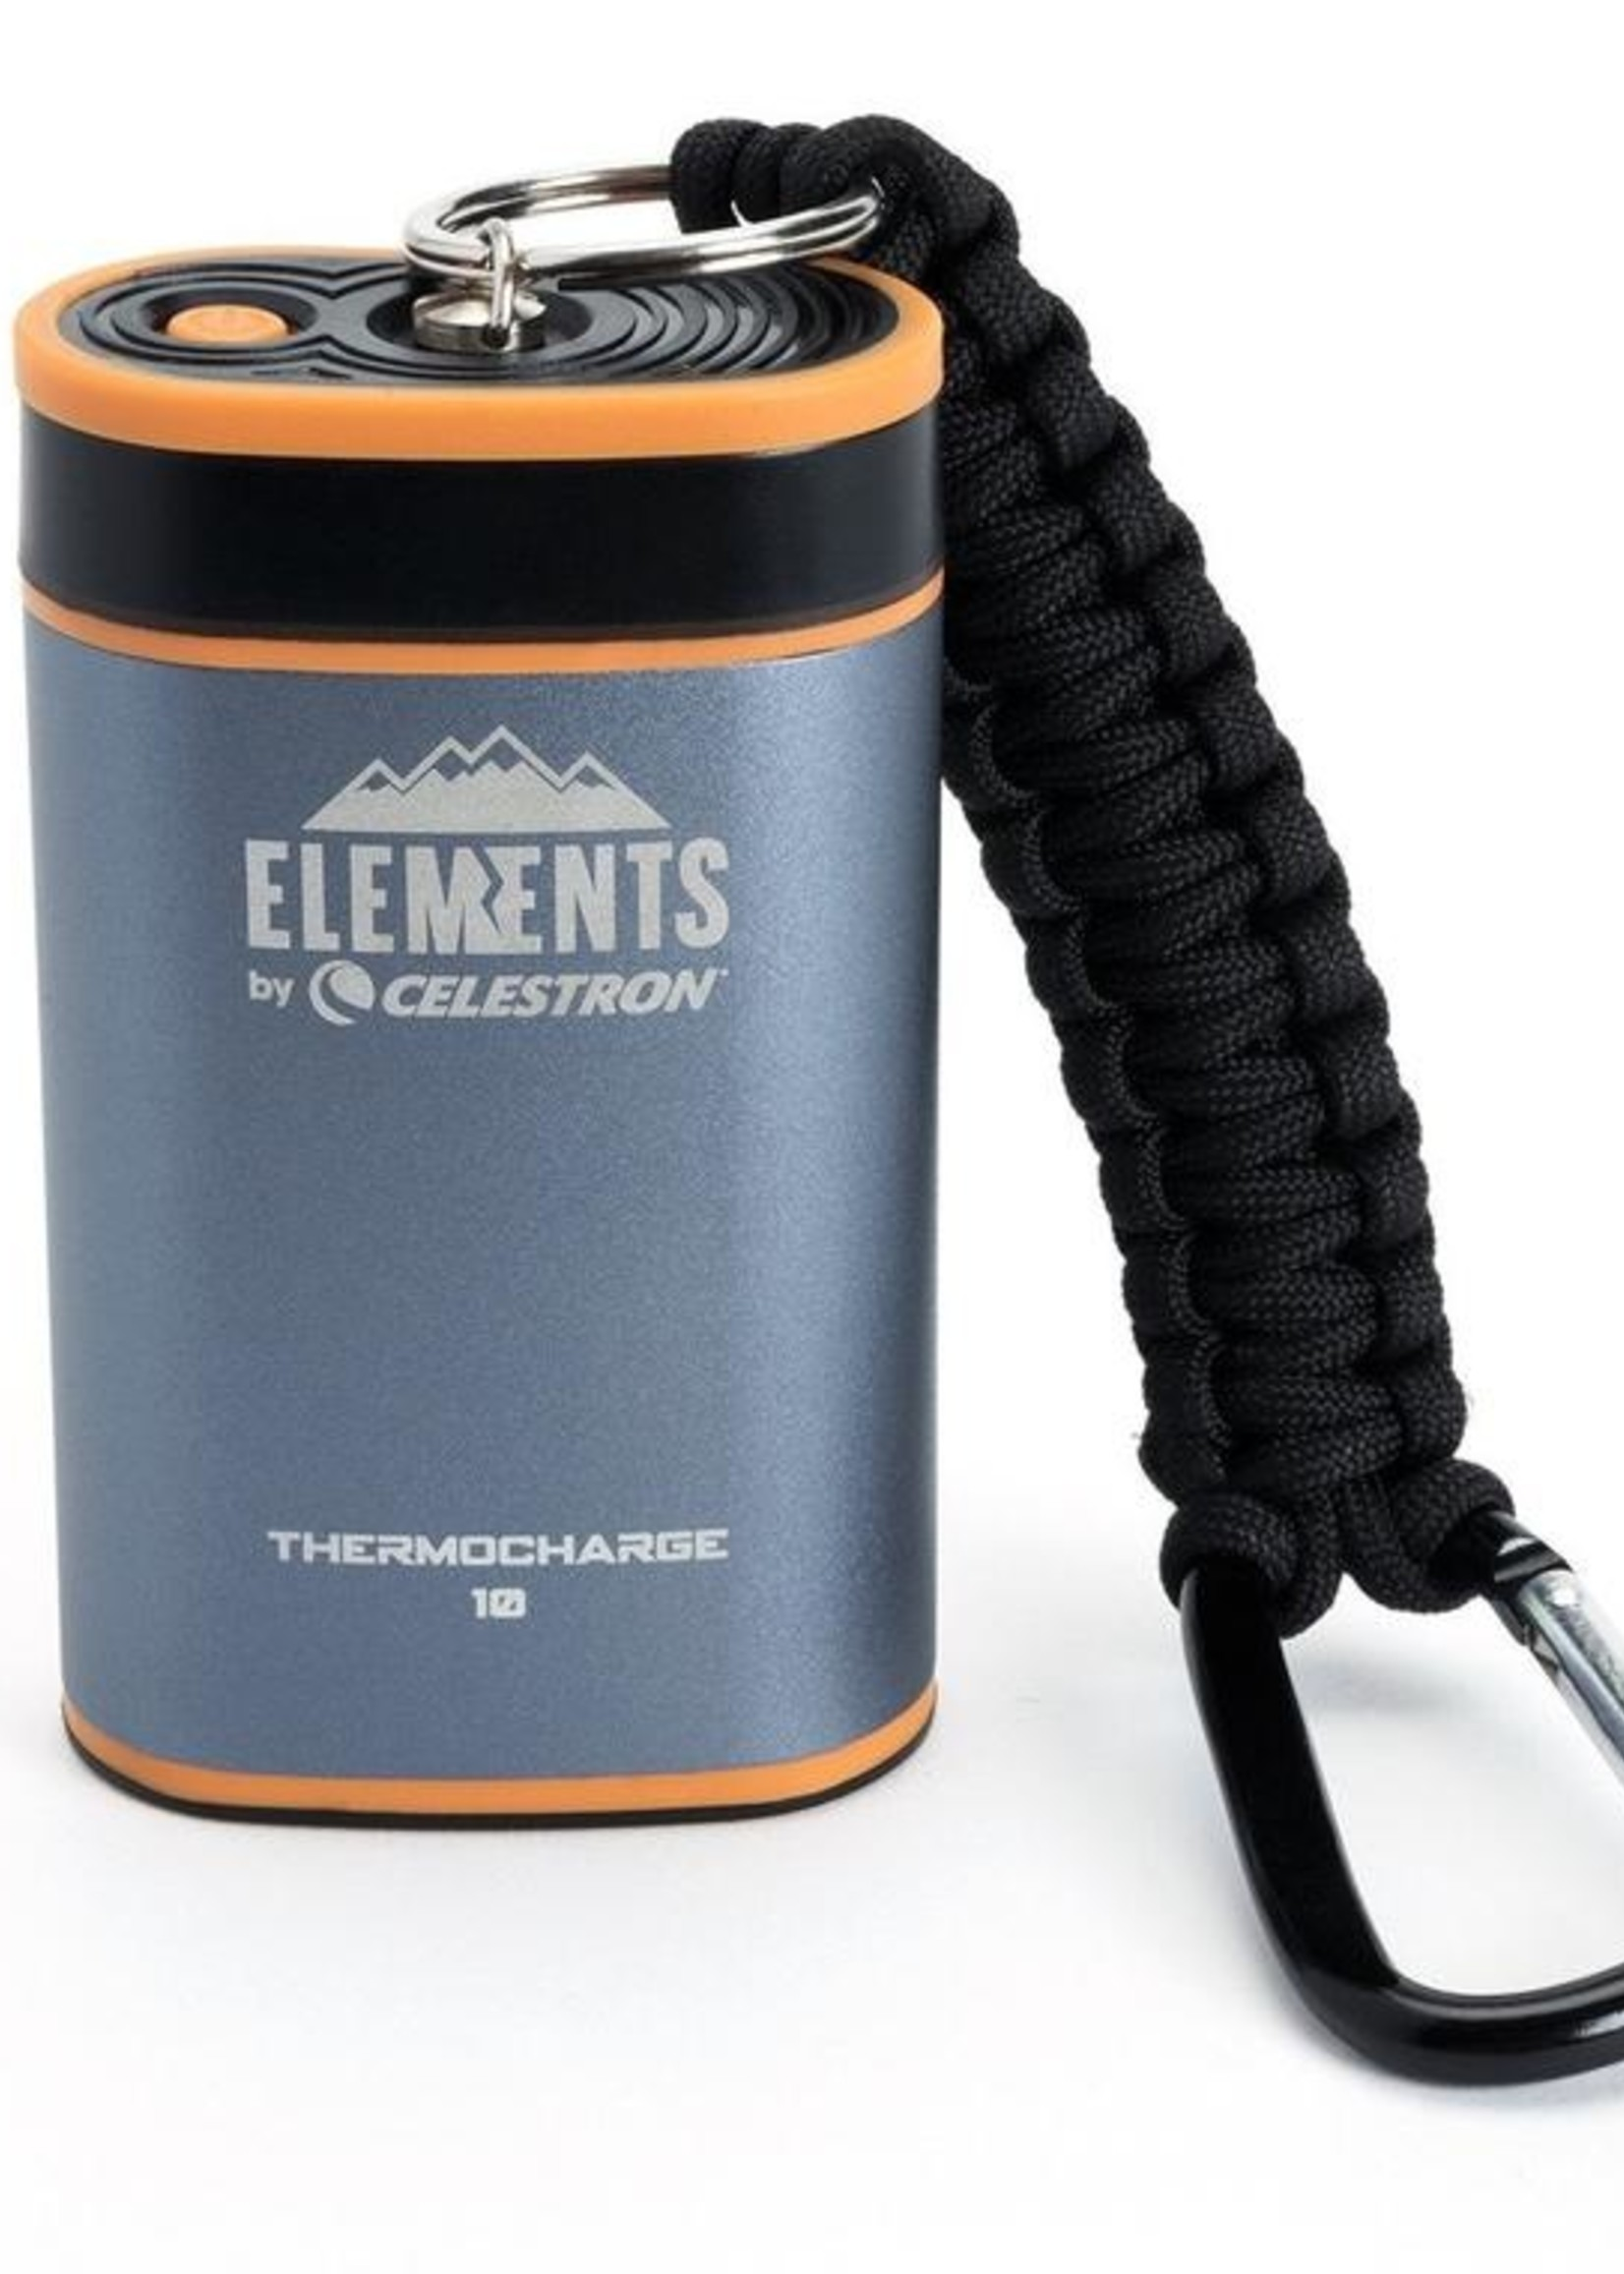 Celestron Celestron Elements ThermoCharge 10